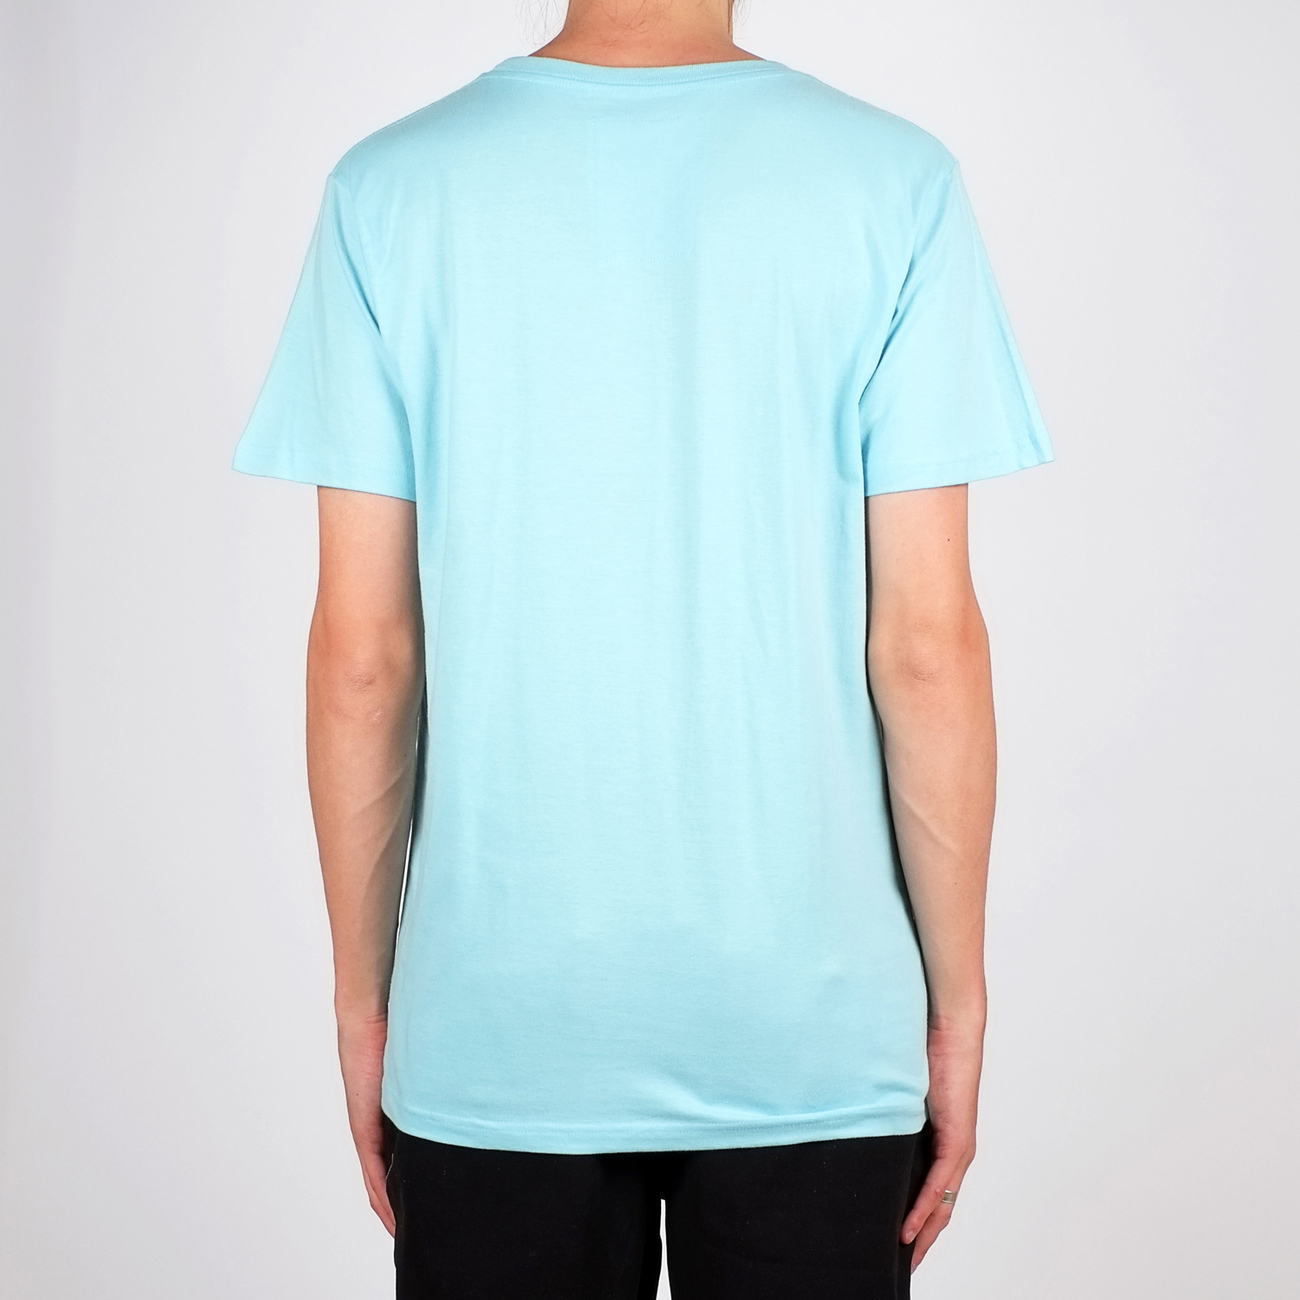 T-shirt Stockholm Drawn Bike Beach Blue